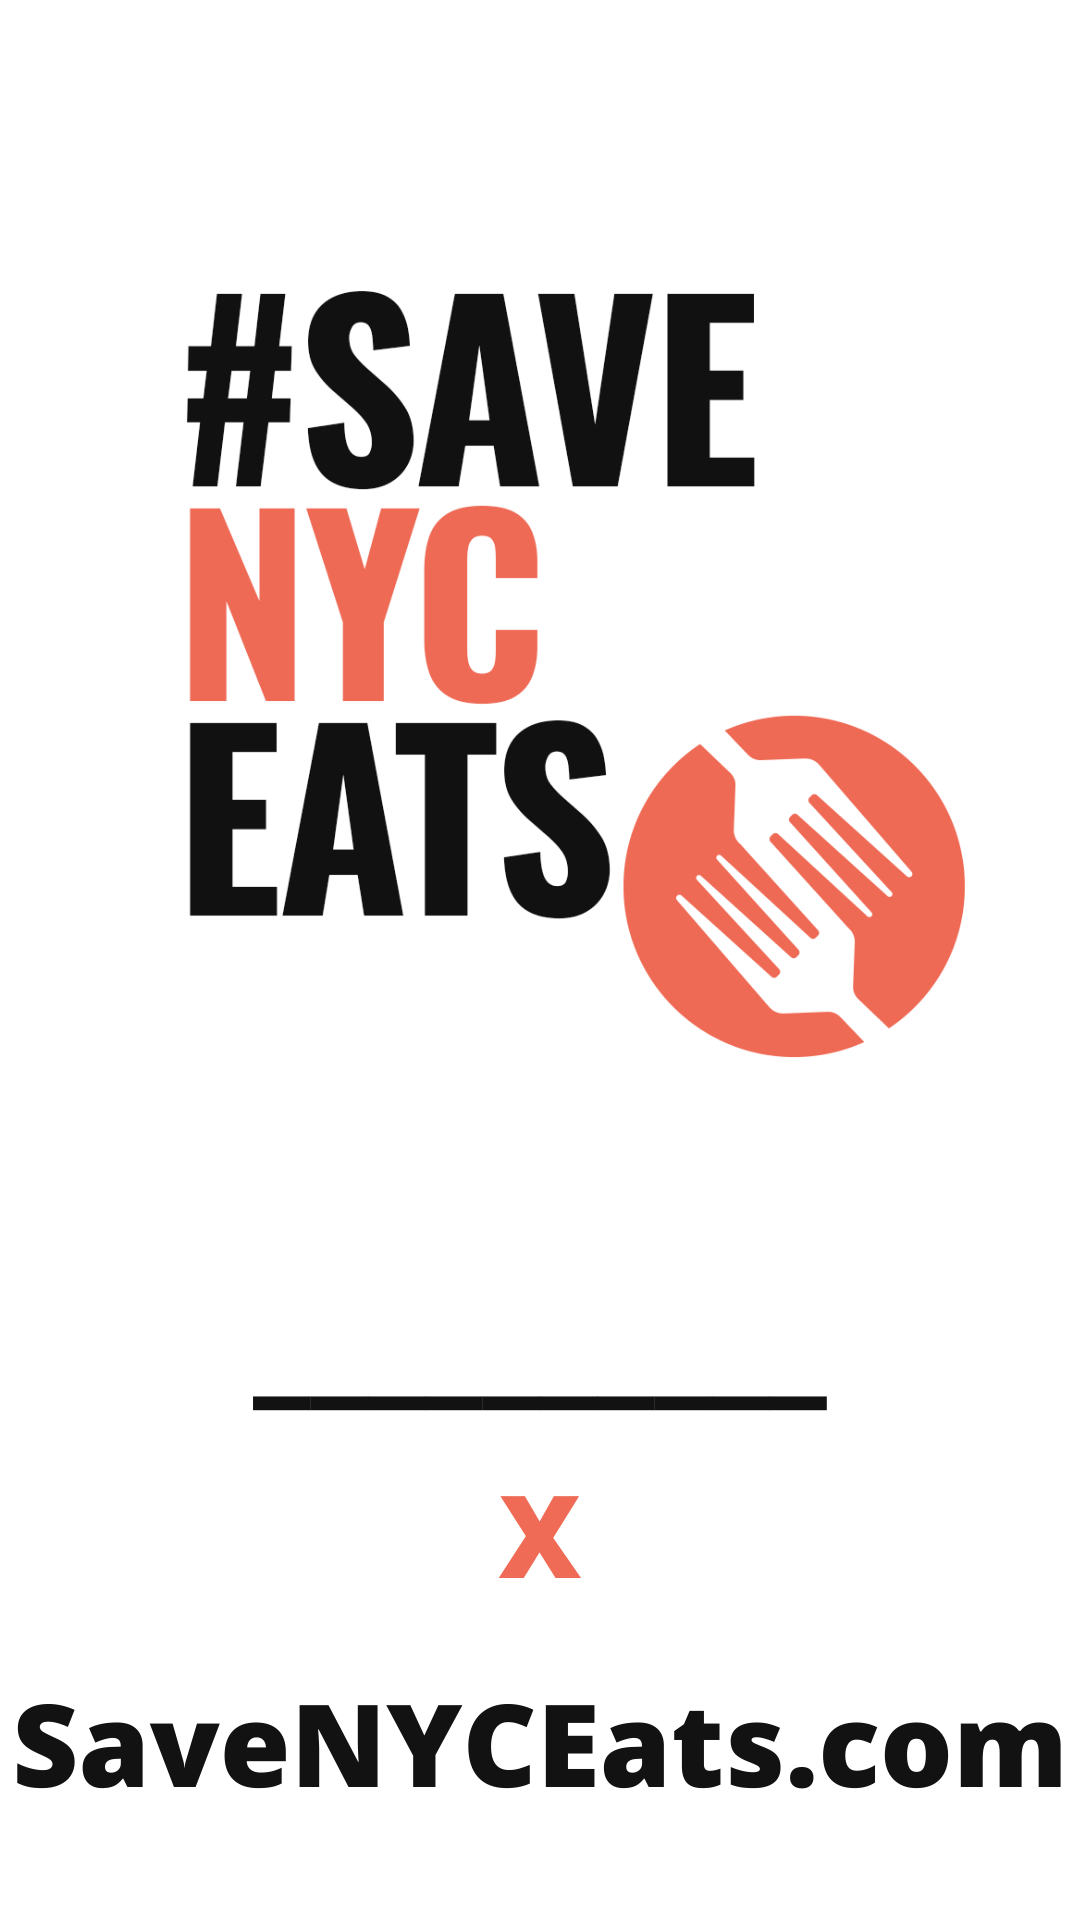 SaveNYCEats.com.png